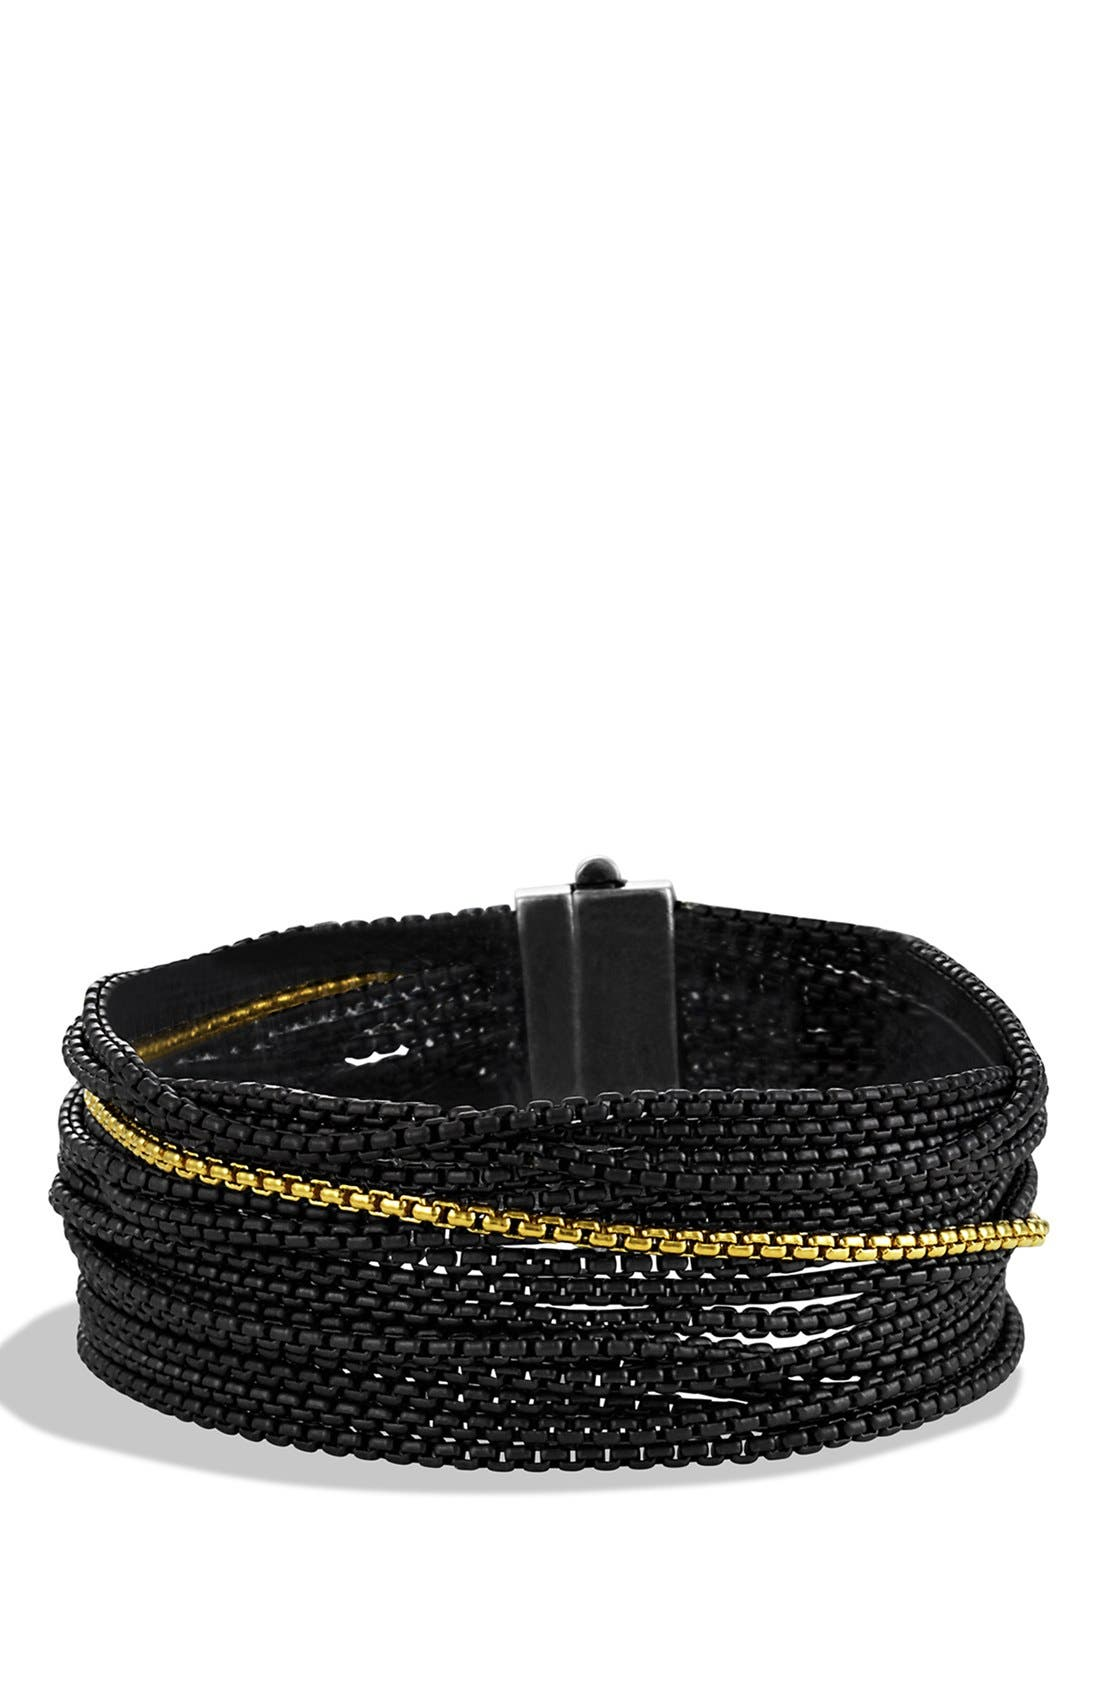 Main Image - David Yurman Sixteen-Row Chain Bracelet with Gold